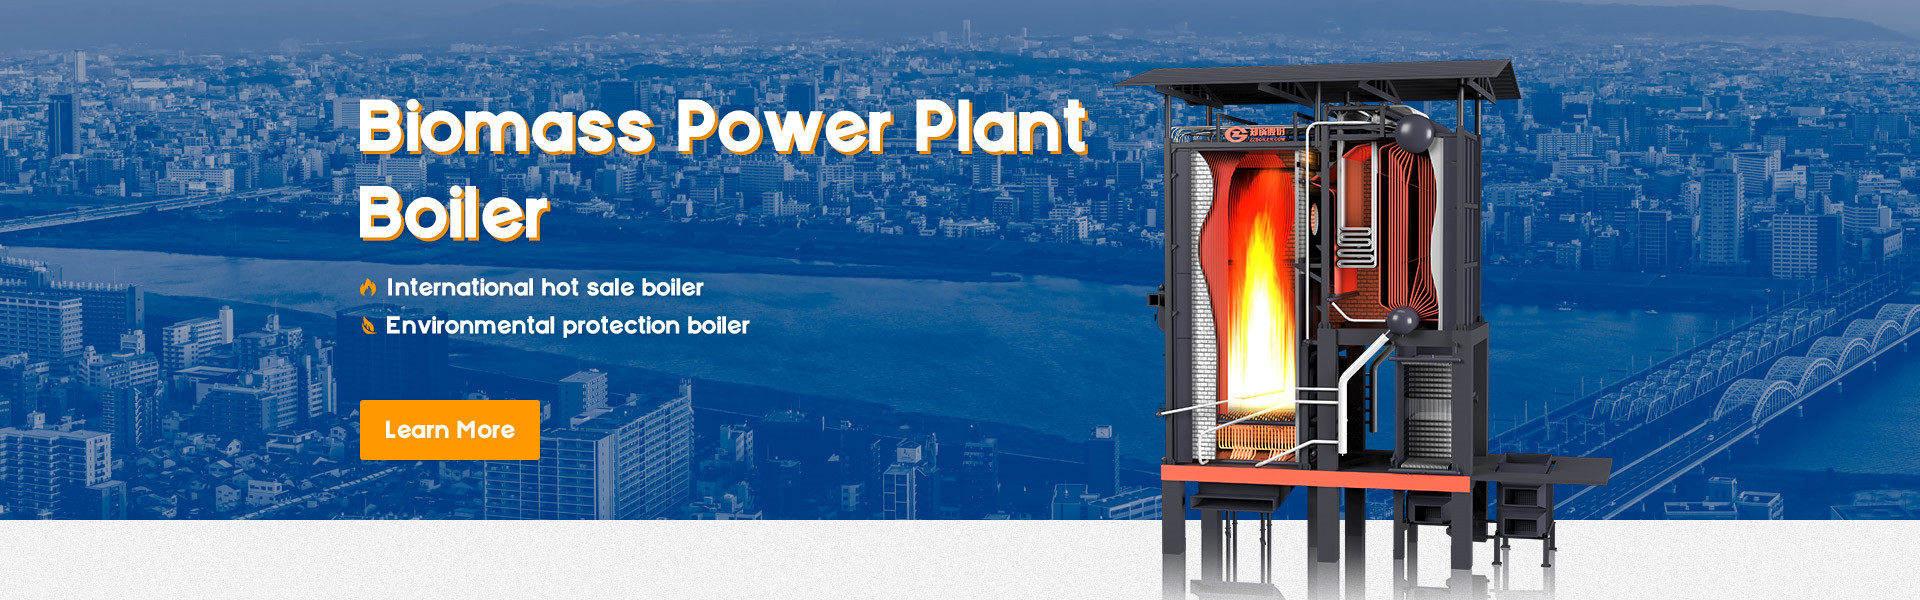 ZBG biomass boiler-Zhengzhou Boiler Co., Ltd.